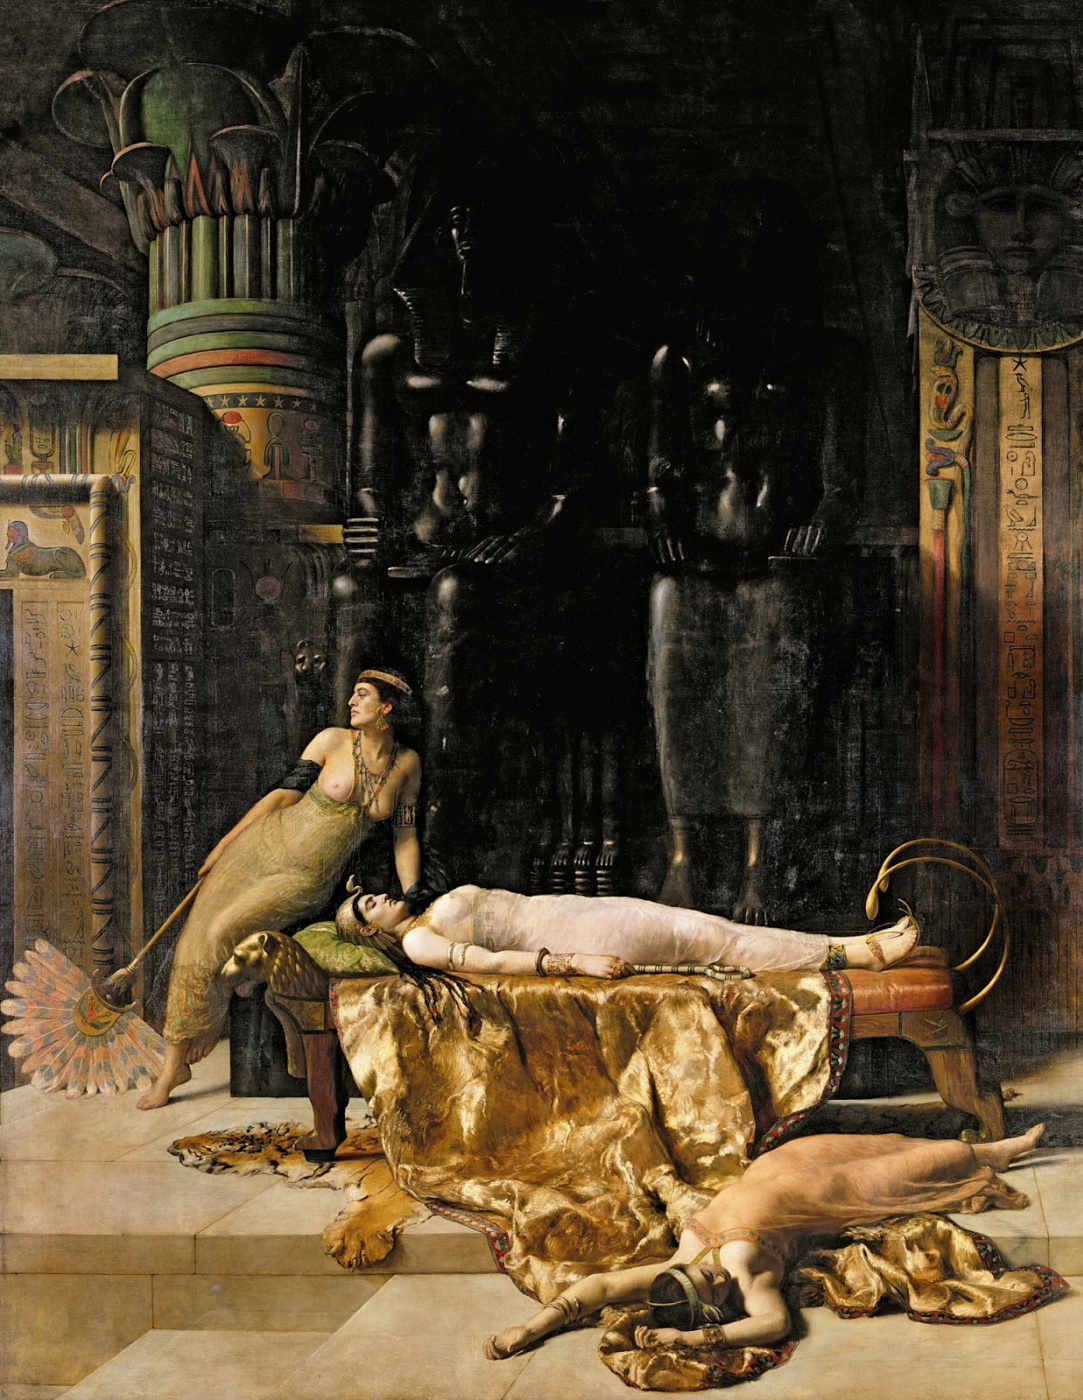 John Collier. Cleopatra's death. 1890